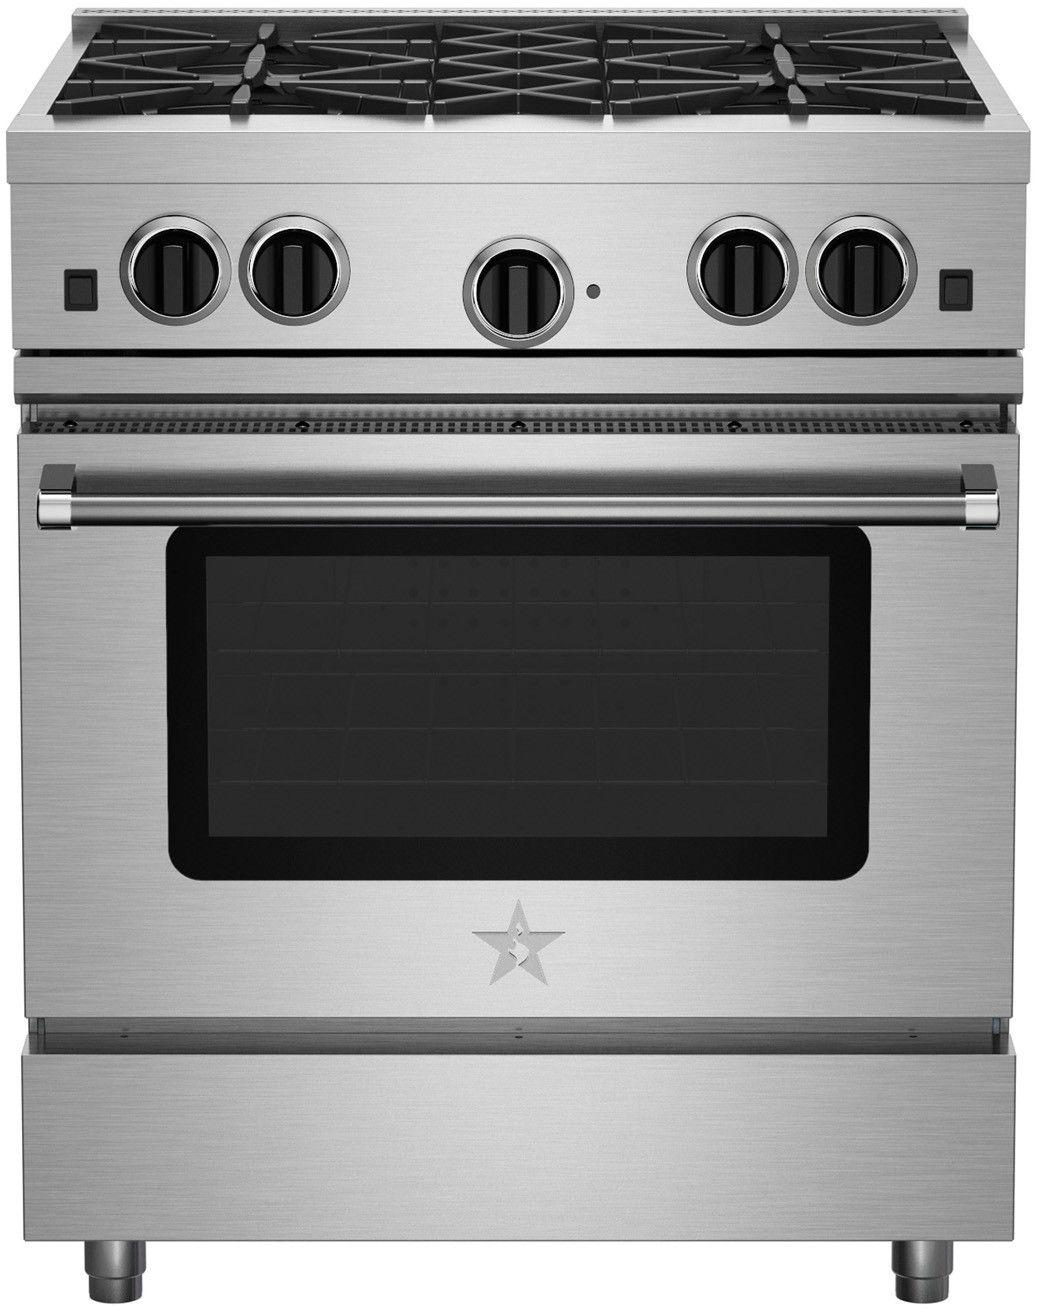 Bluestar Culinary Series Rcs304bv2ng Convection Oven Countertop Convection Oven Gas Range